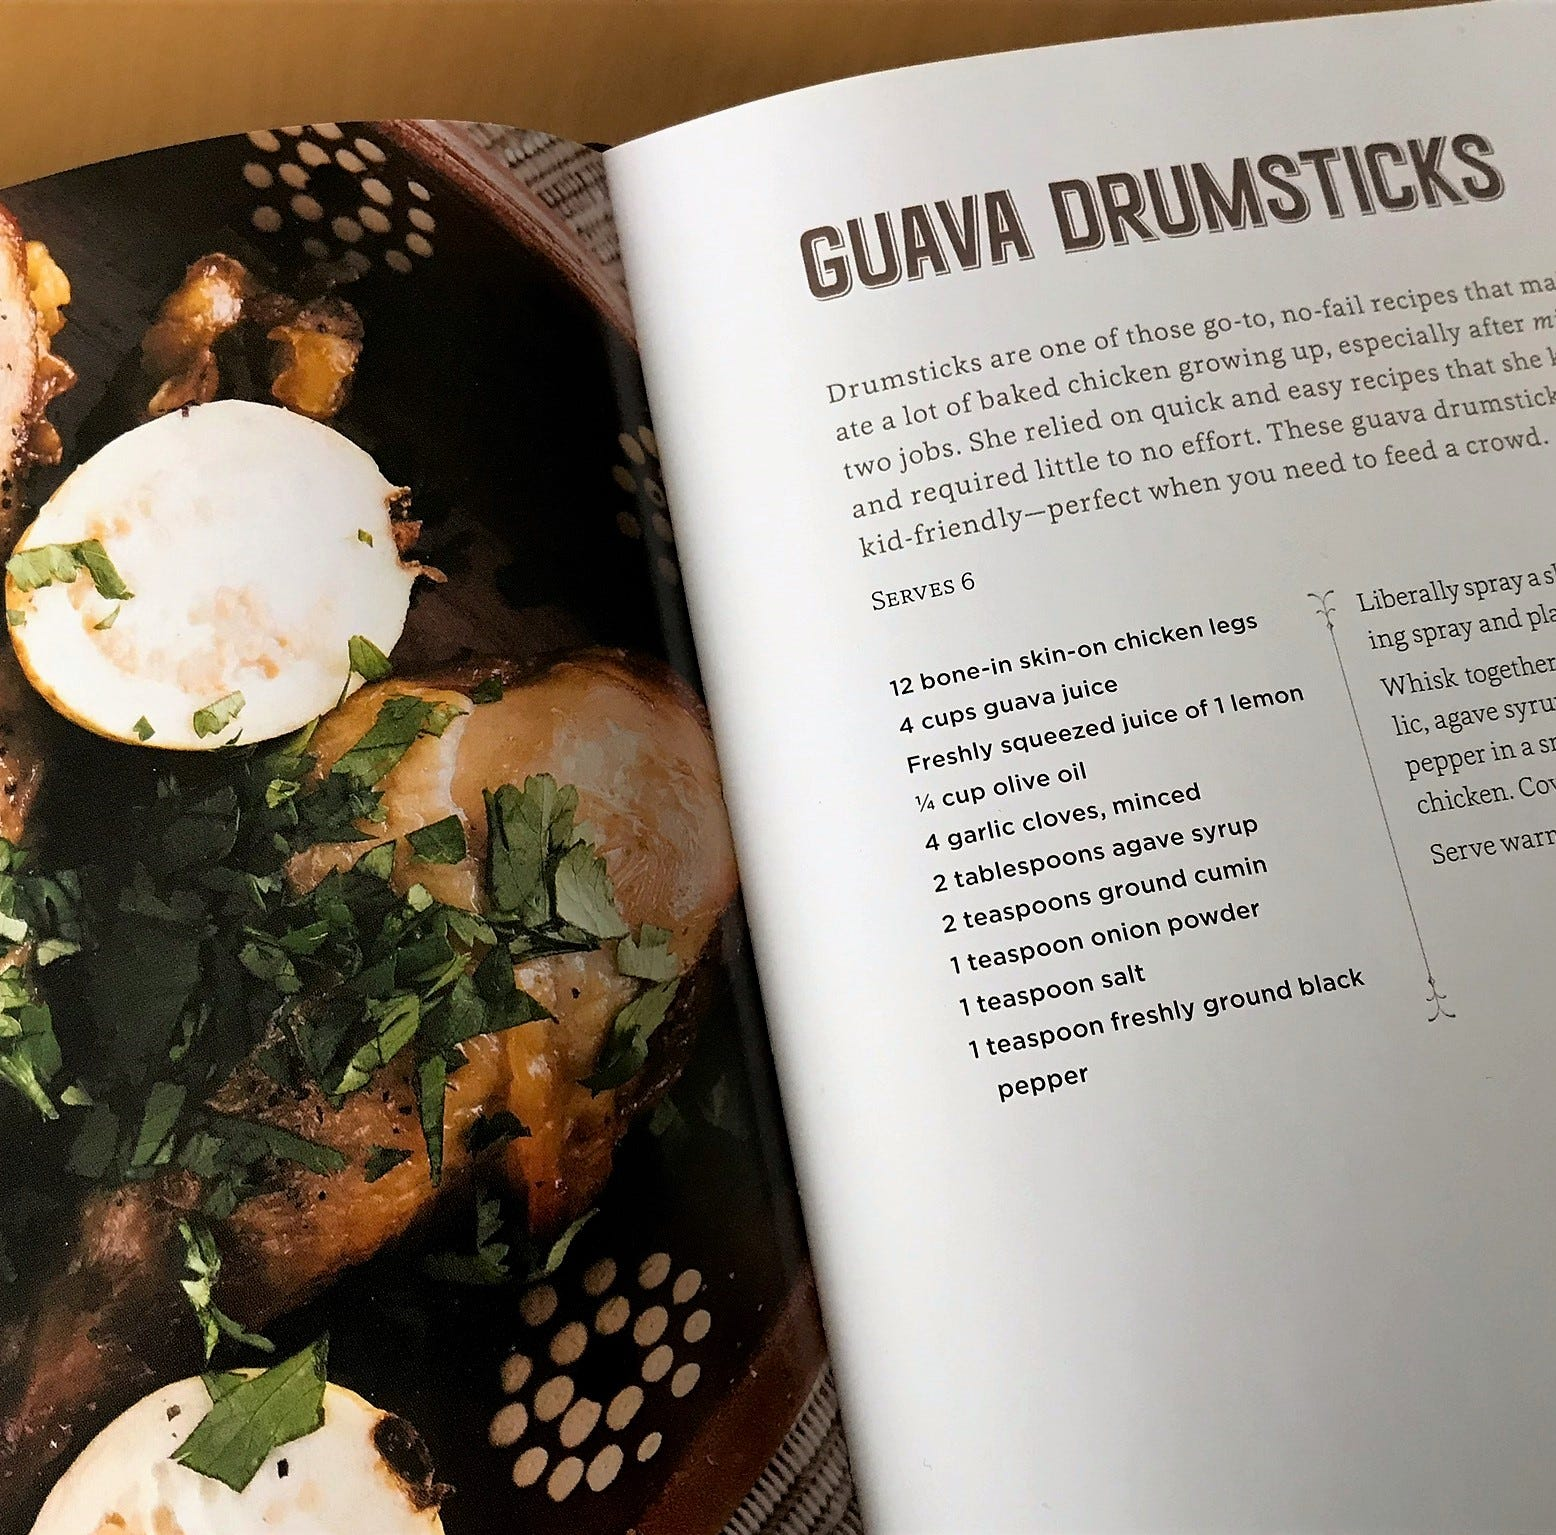 Tex-Mex slow cooker cookbook delivers authentic flavors